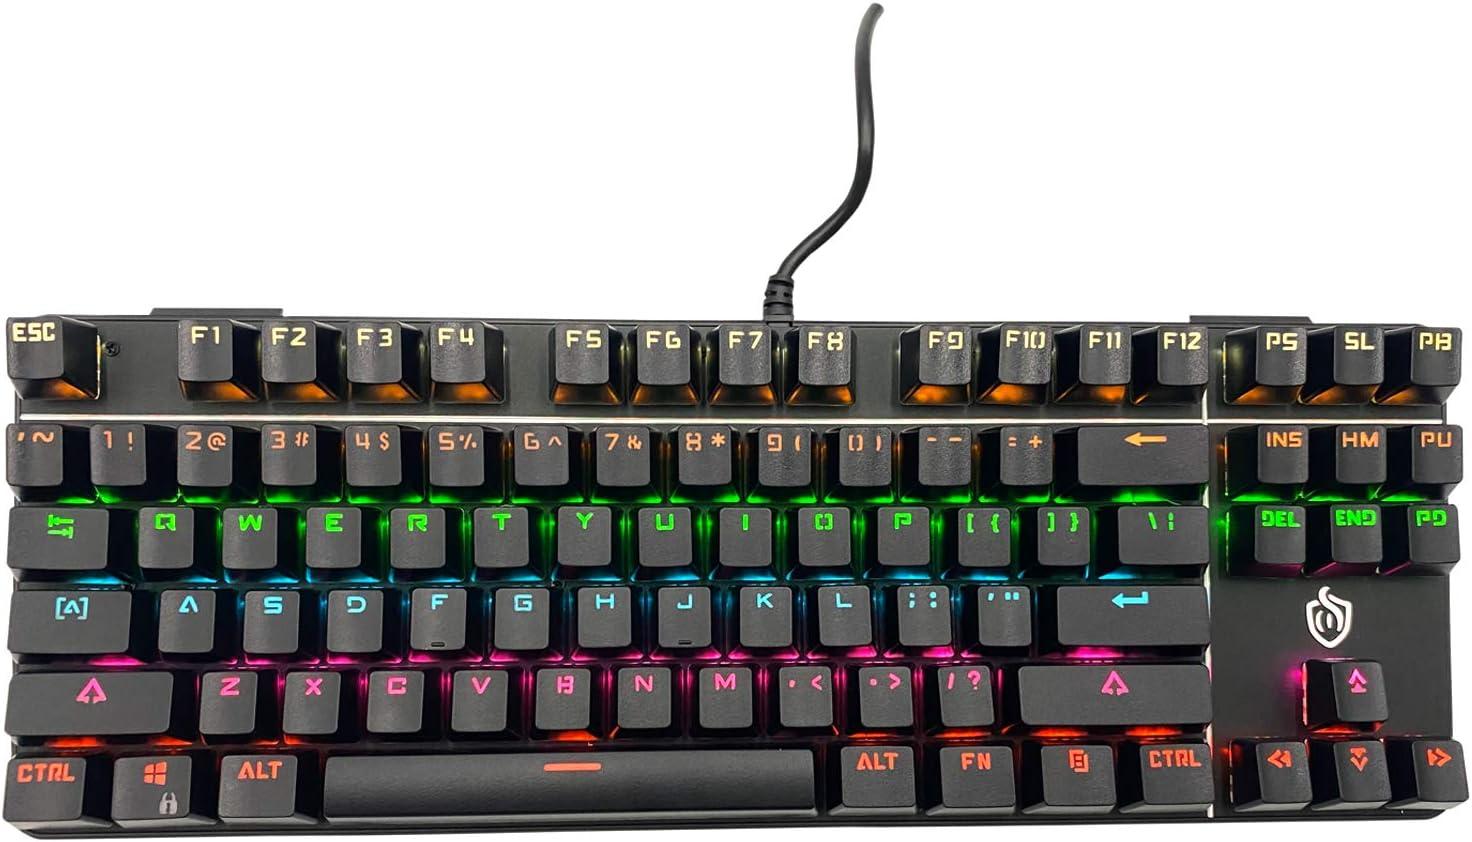 K917 RGB Mechanical Gaming Keyboard 87Key Retro Keyboard-Blue Switch-LED Backlit- Round Keycaps Anti-Ghosting Mechanical Illuminated Keyboard for PC Gaming and MAC (Classic-Black)